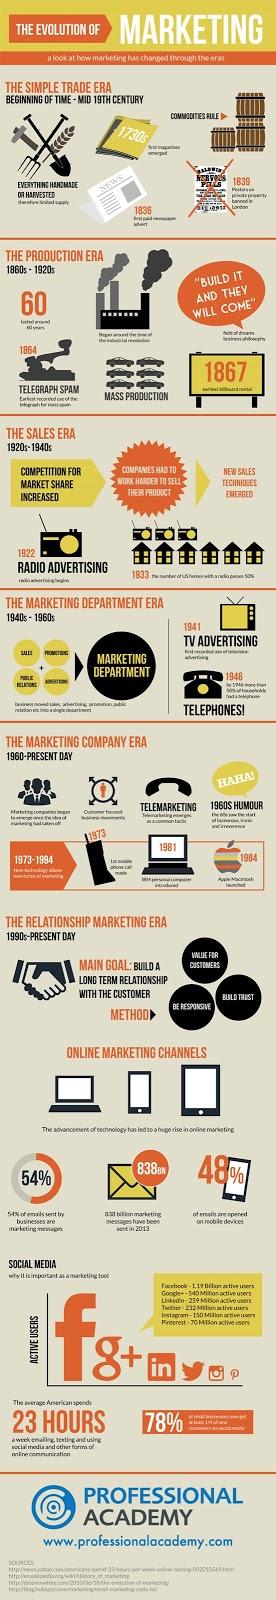 evolution-of-marketing